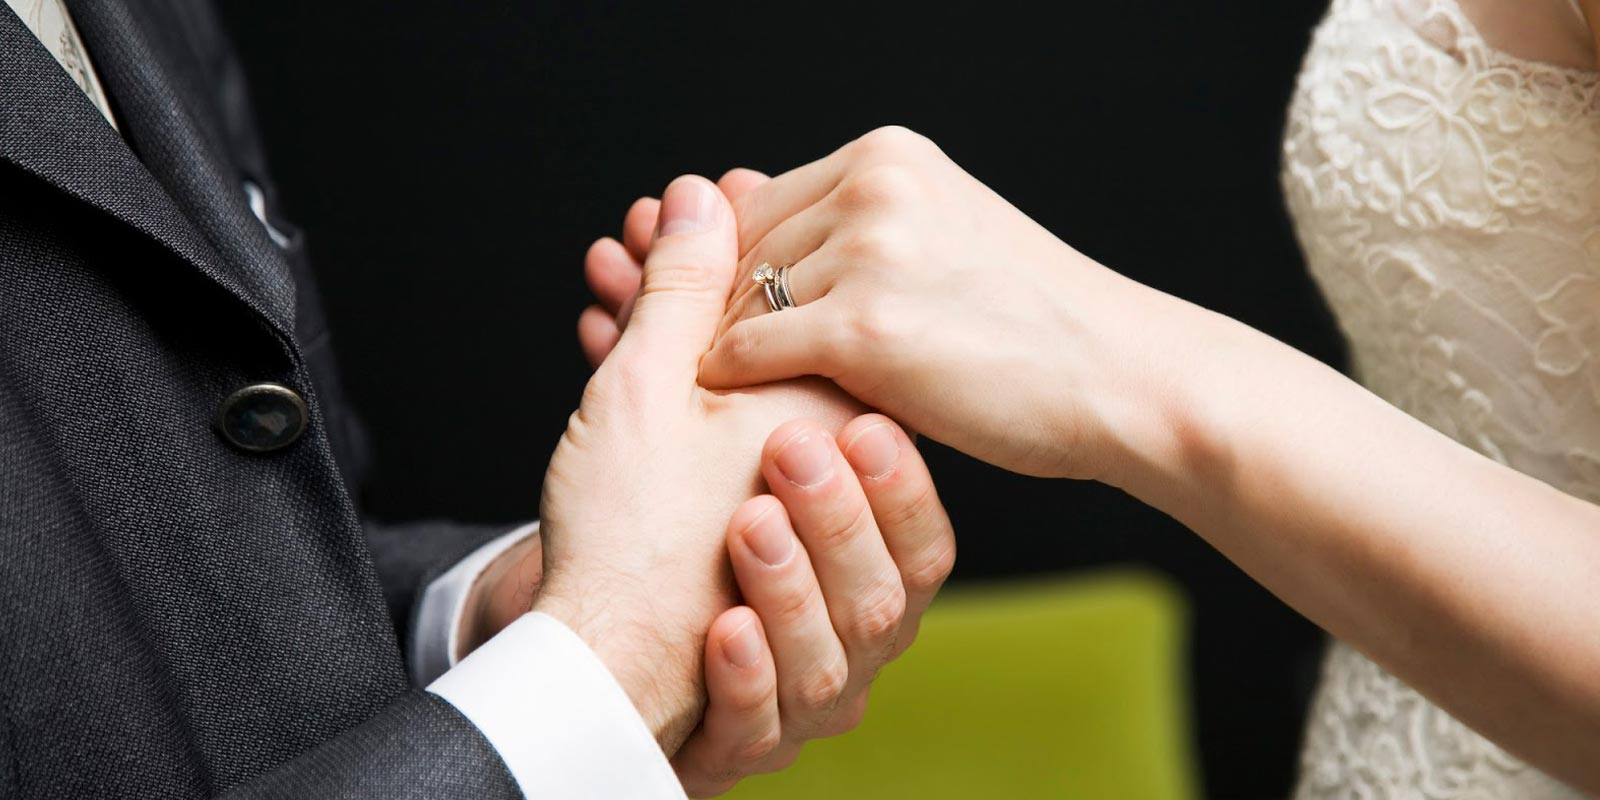 Matrimonio Simbolico Promesse : Le promesse di matrimonio nella cerimonia simbolica